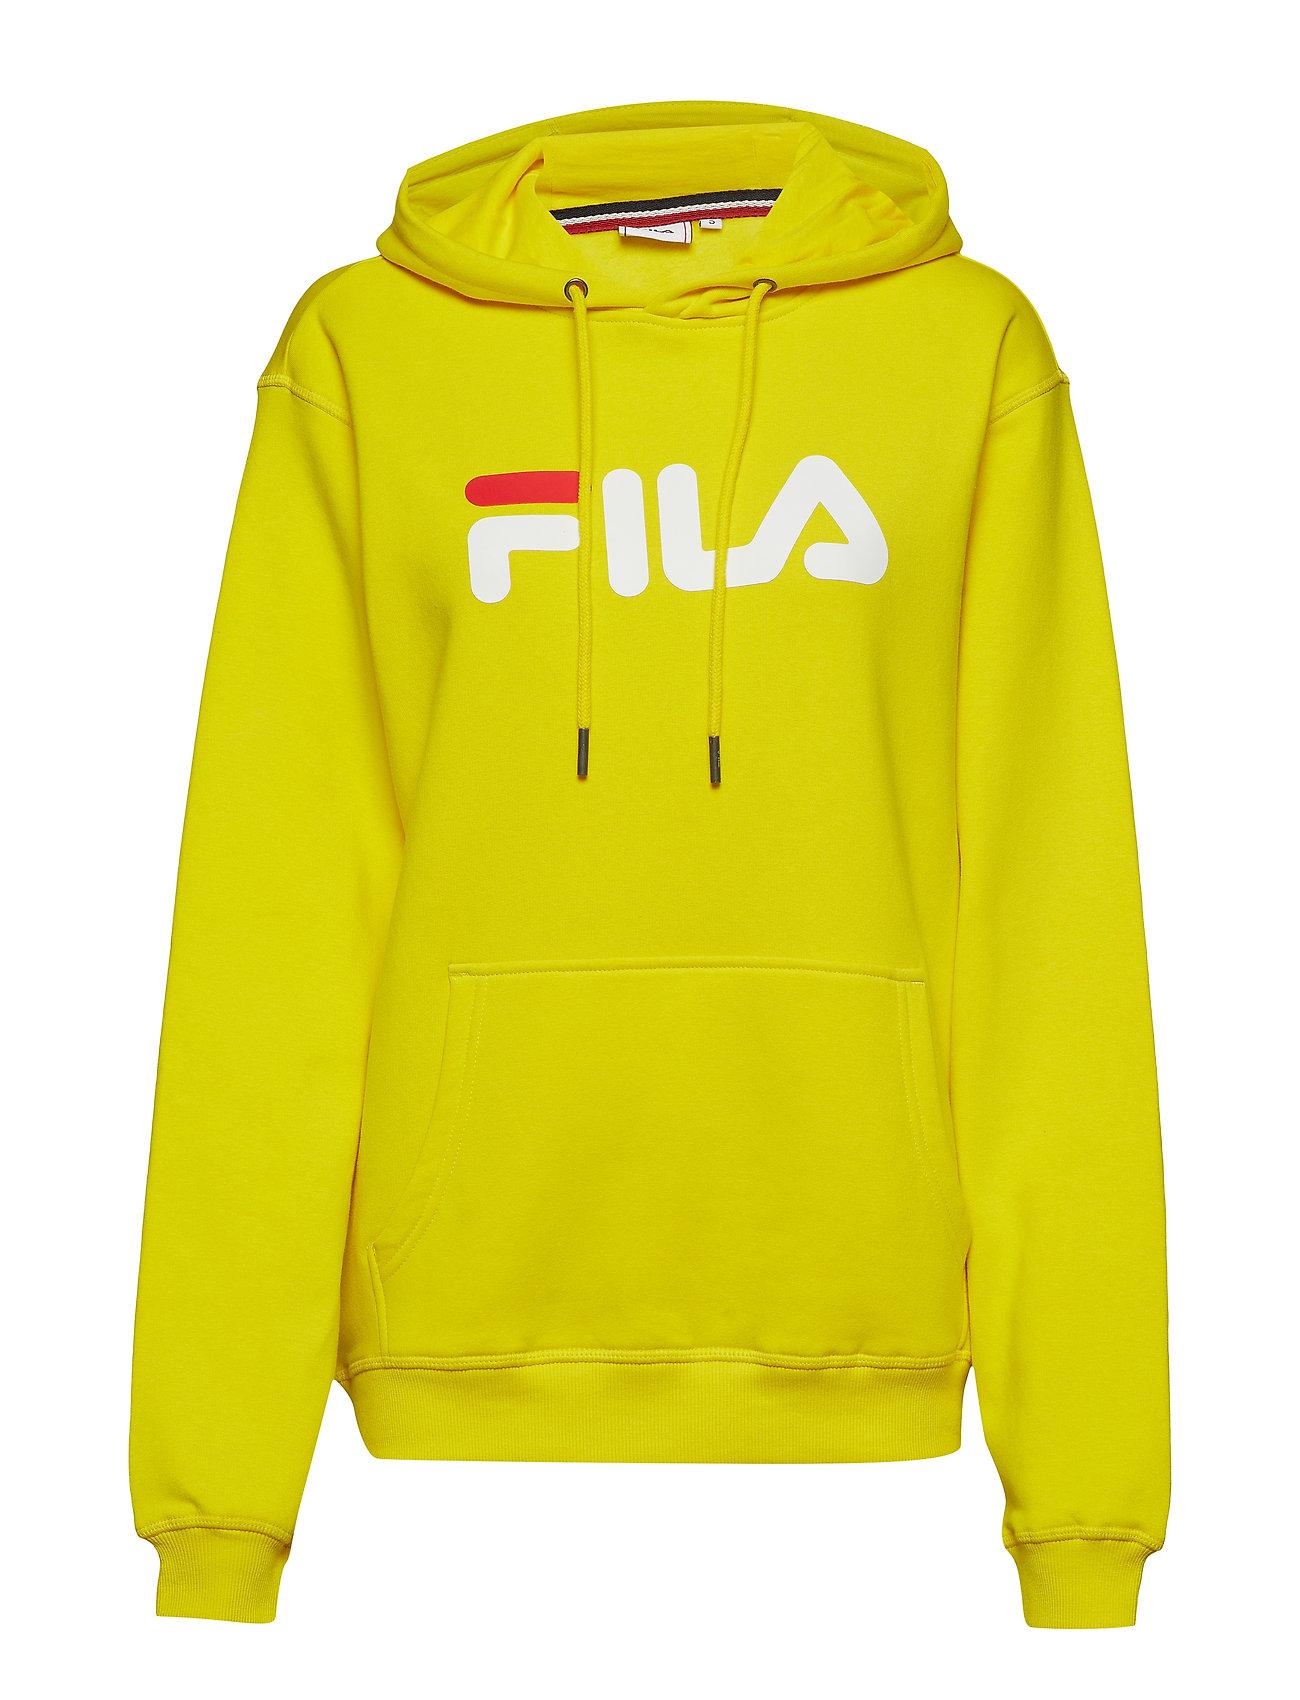 5e6ffcf9ecd Classic Pure Hoody Kangaroo (Empire Yellow) (£44.85) - FILA ...